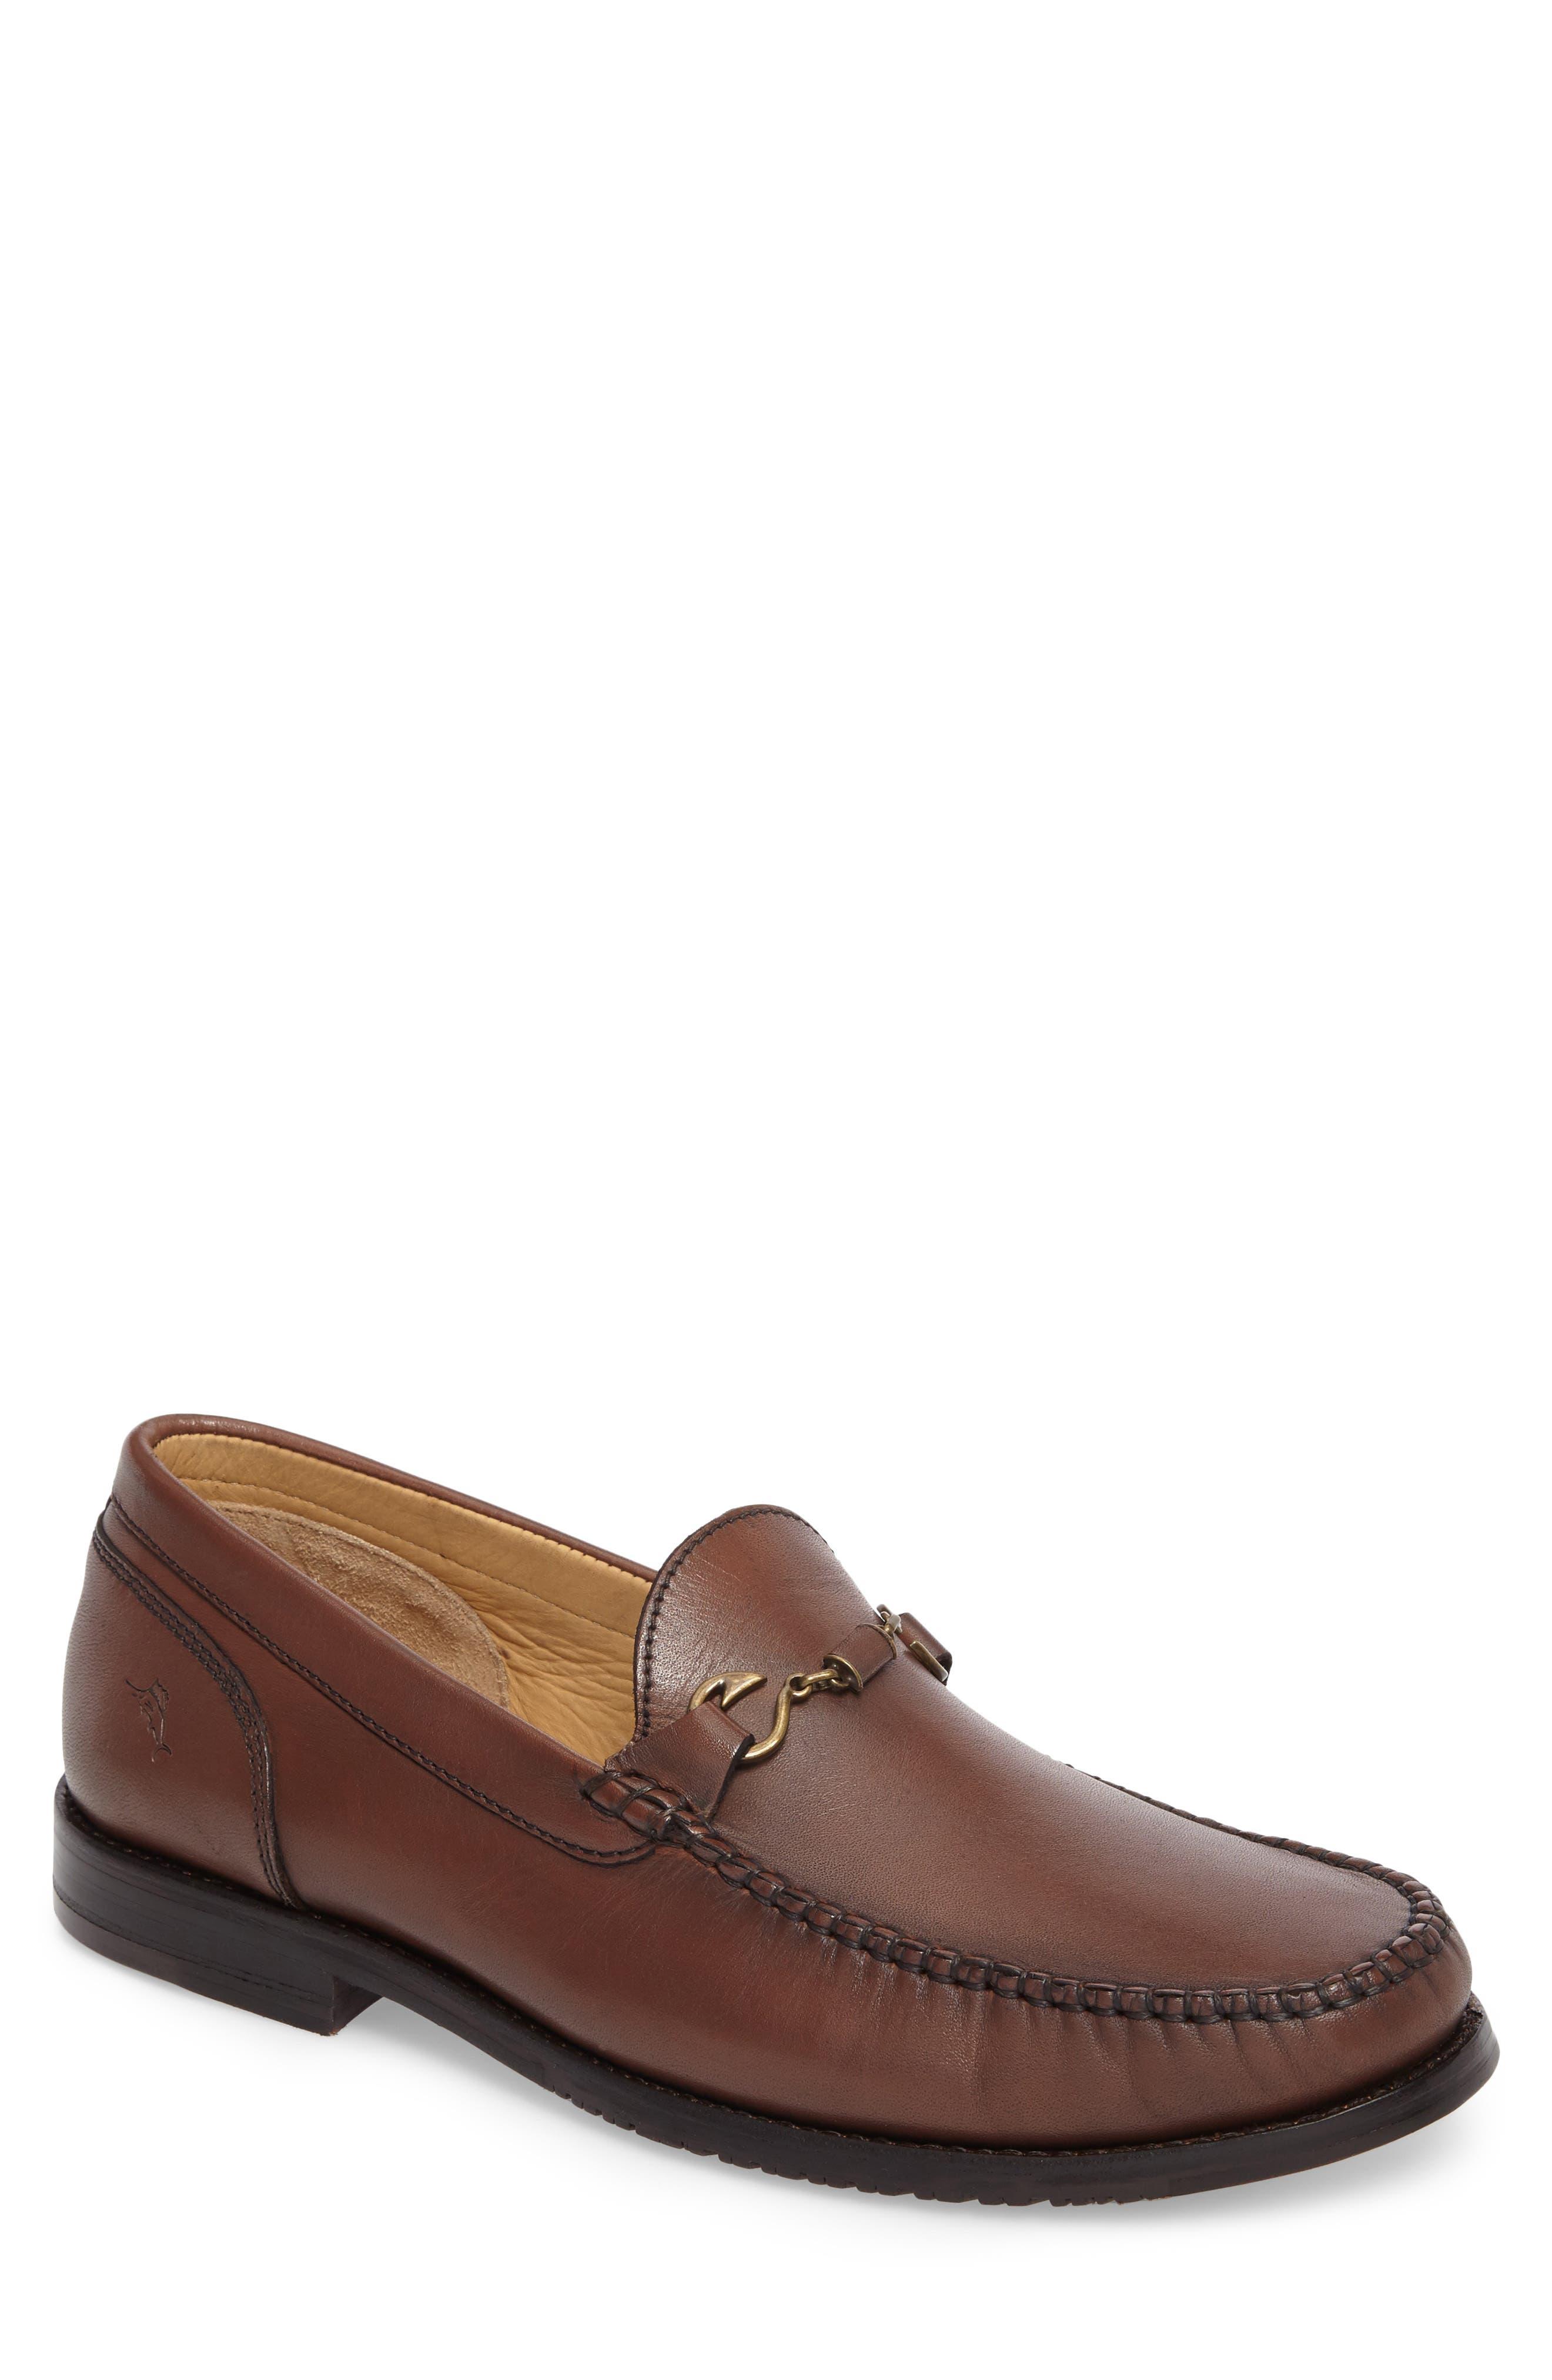 Maya Bay Bit Loafer,                         Main,                         color, Brown Leather